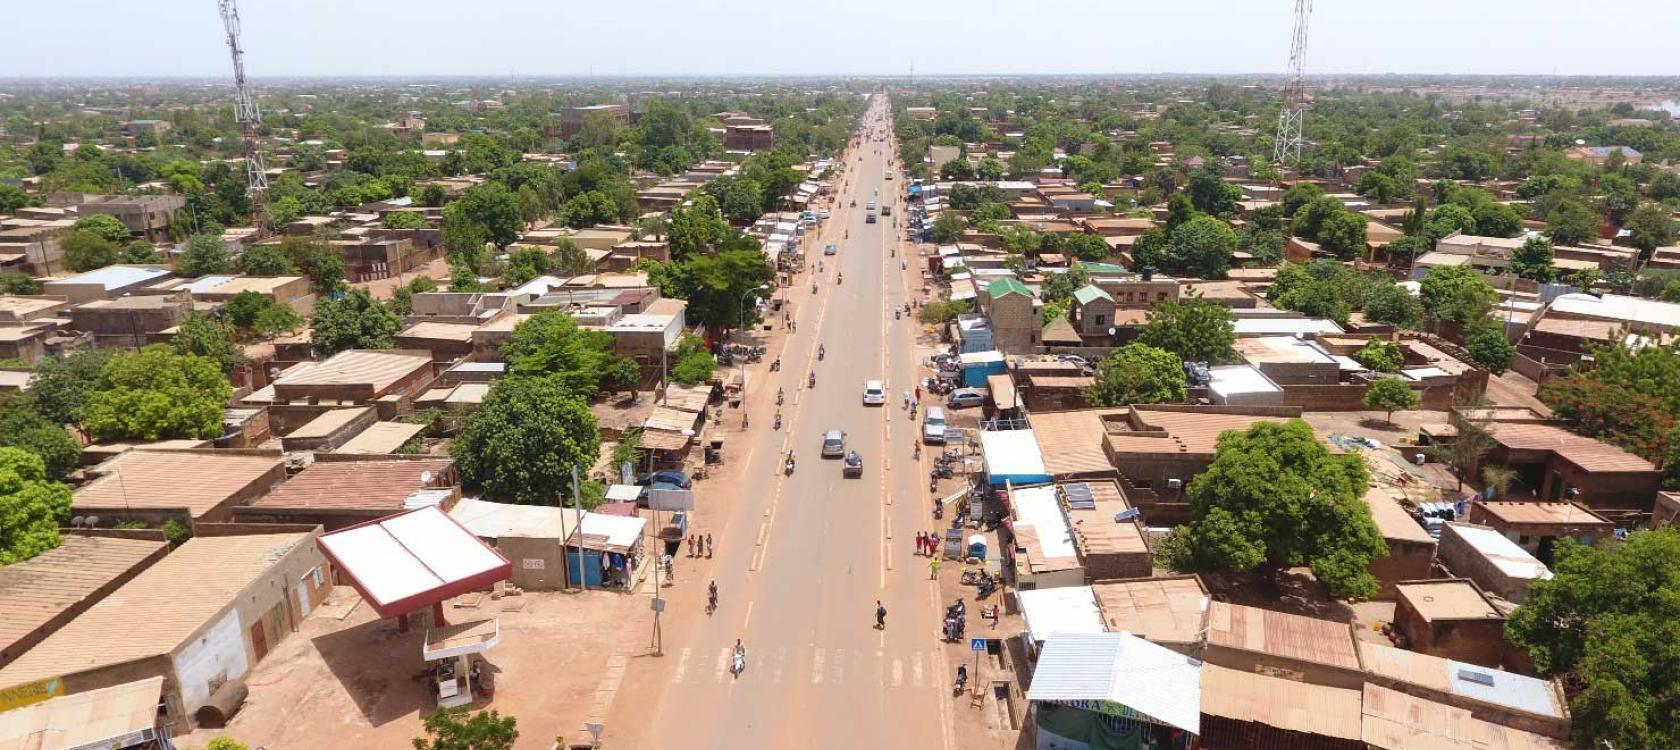 ville-route-renovee-amenagement-urbain-ouagadougou-burkina-faso-guebo